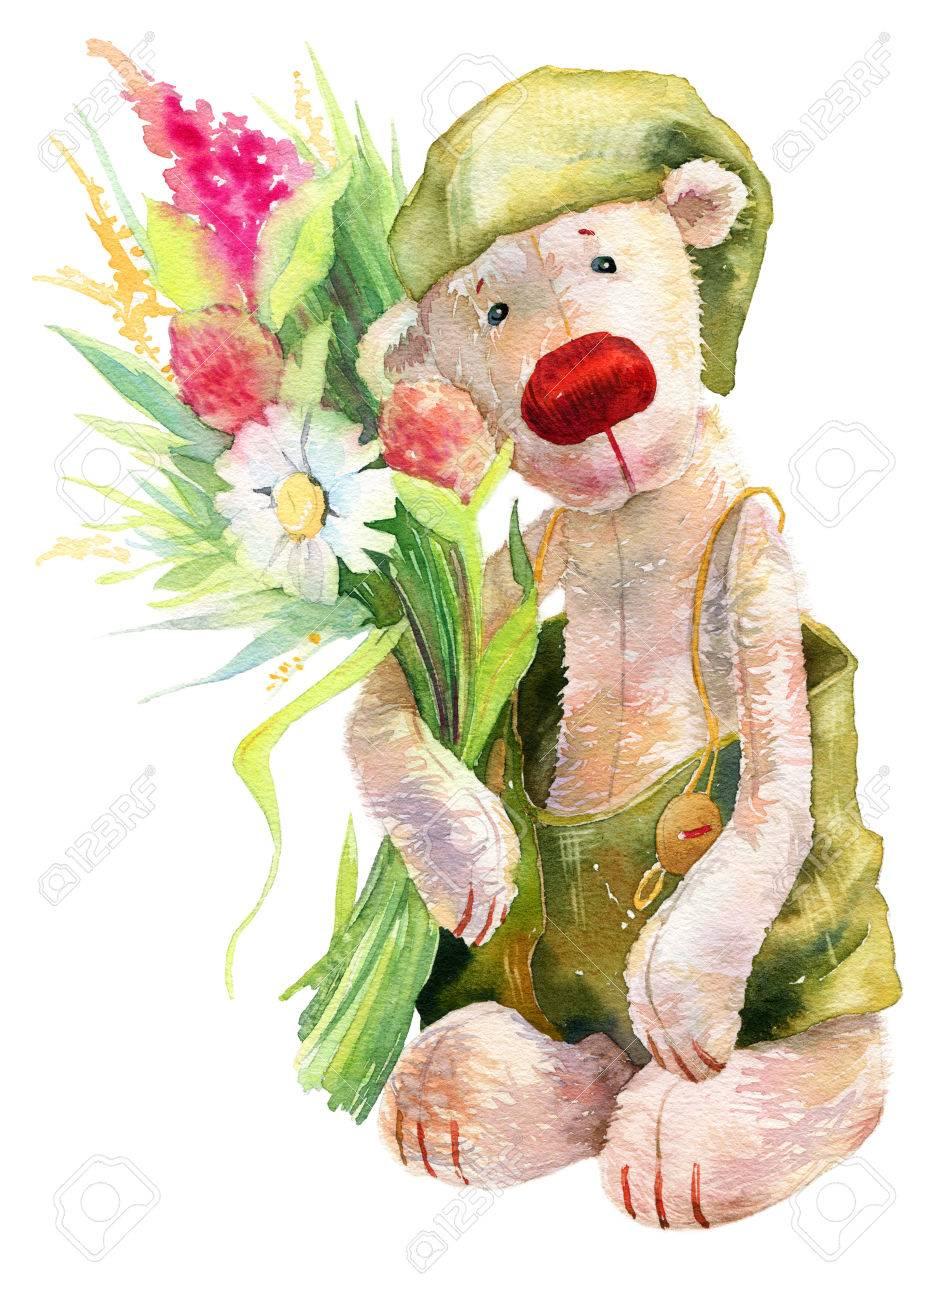 Cute watercolor teddy bear with flowers kid birthday card or cute watercolor teddy bear with flowers kid birthday card or other design background stock photo izmirmasajfo